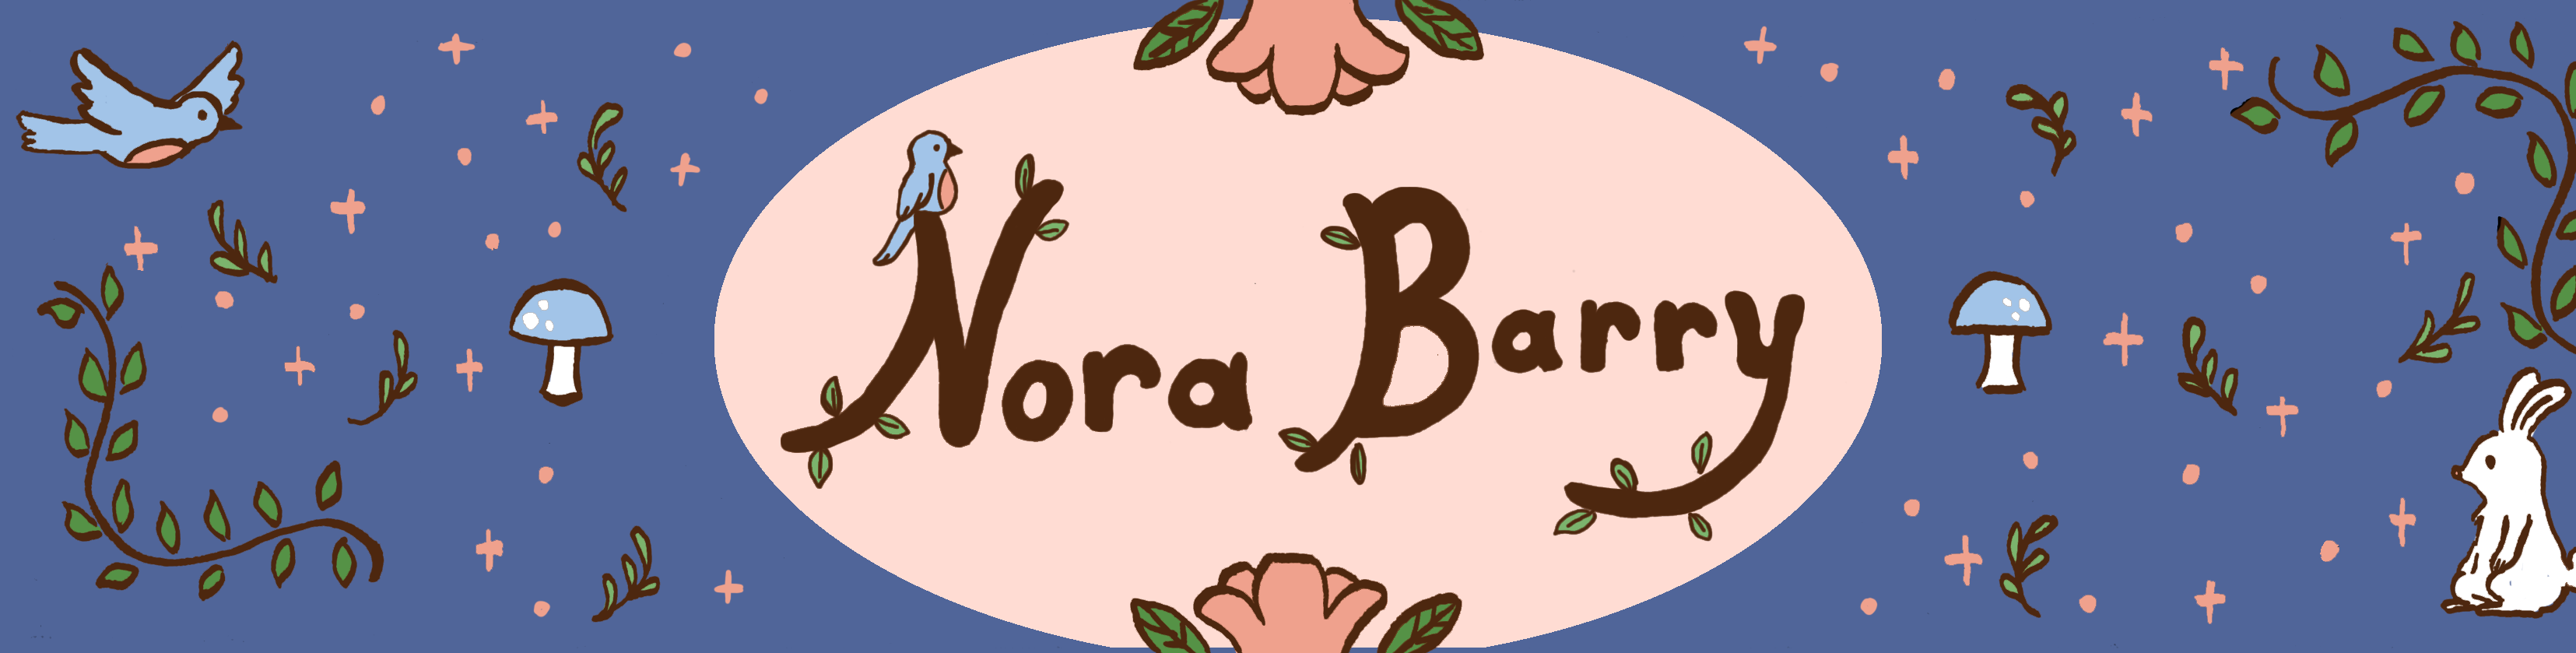 Nora Barry